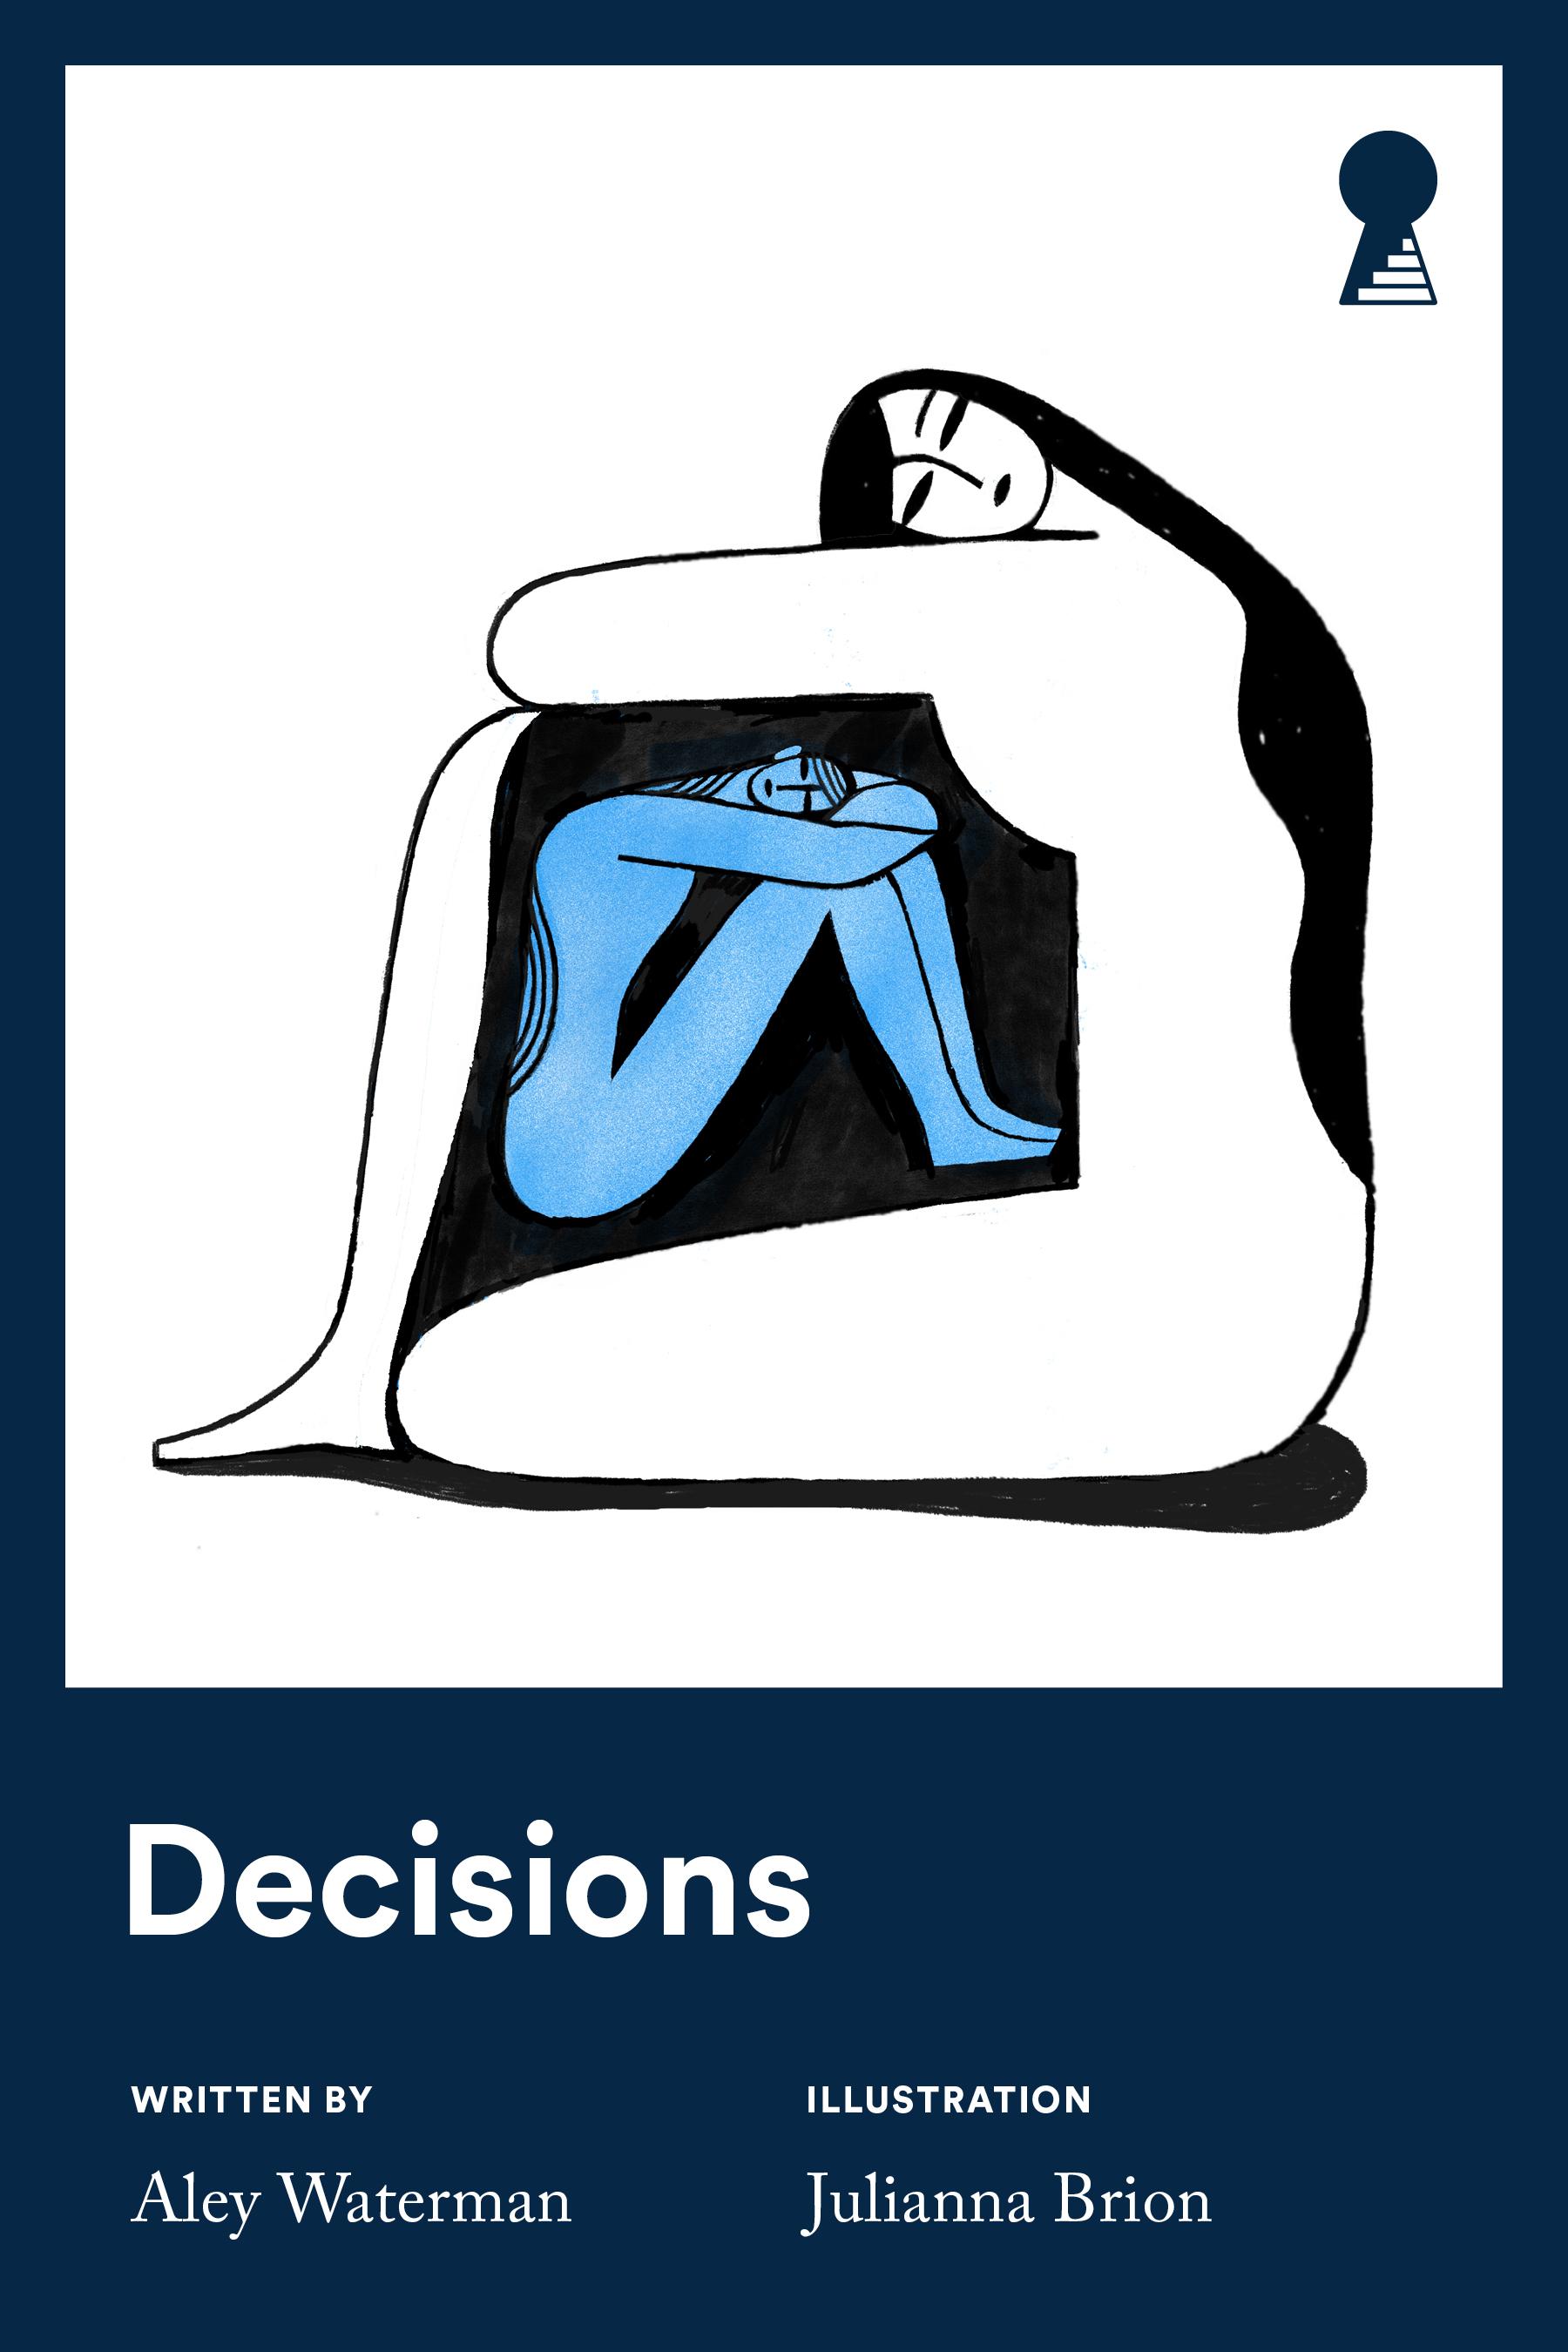 TheVault_Decisions_DesktopCover_Final.jpg